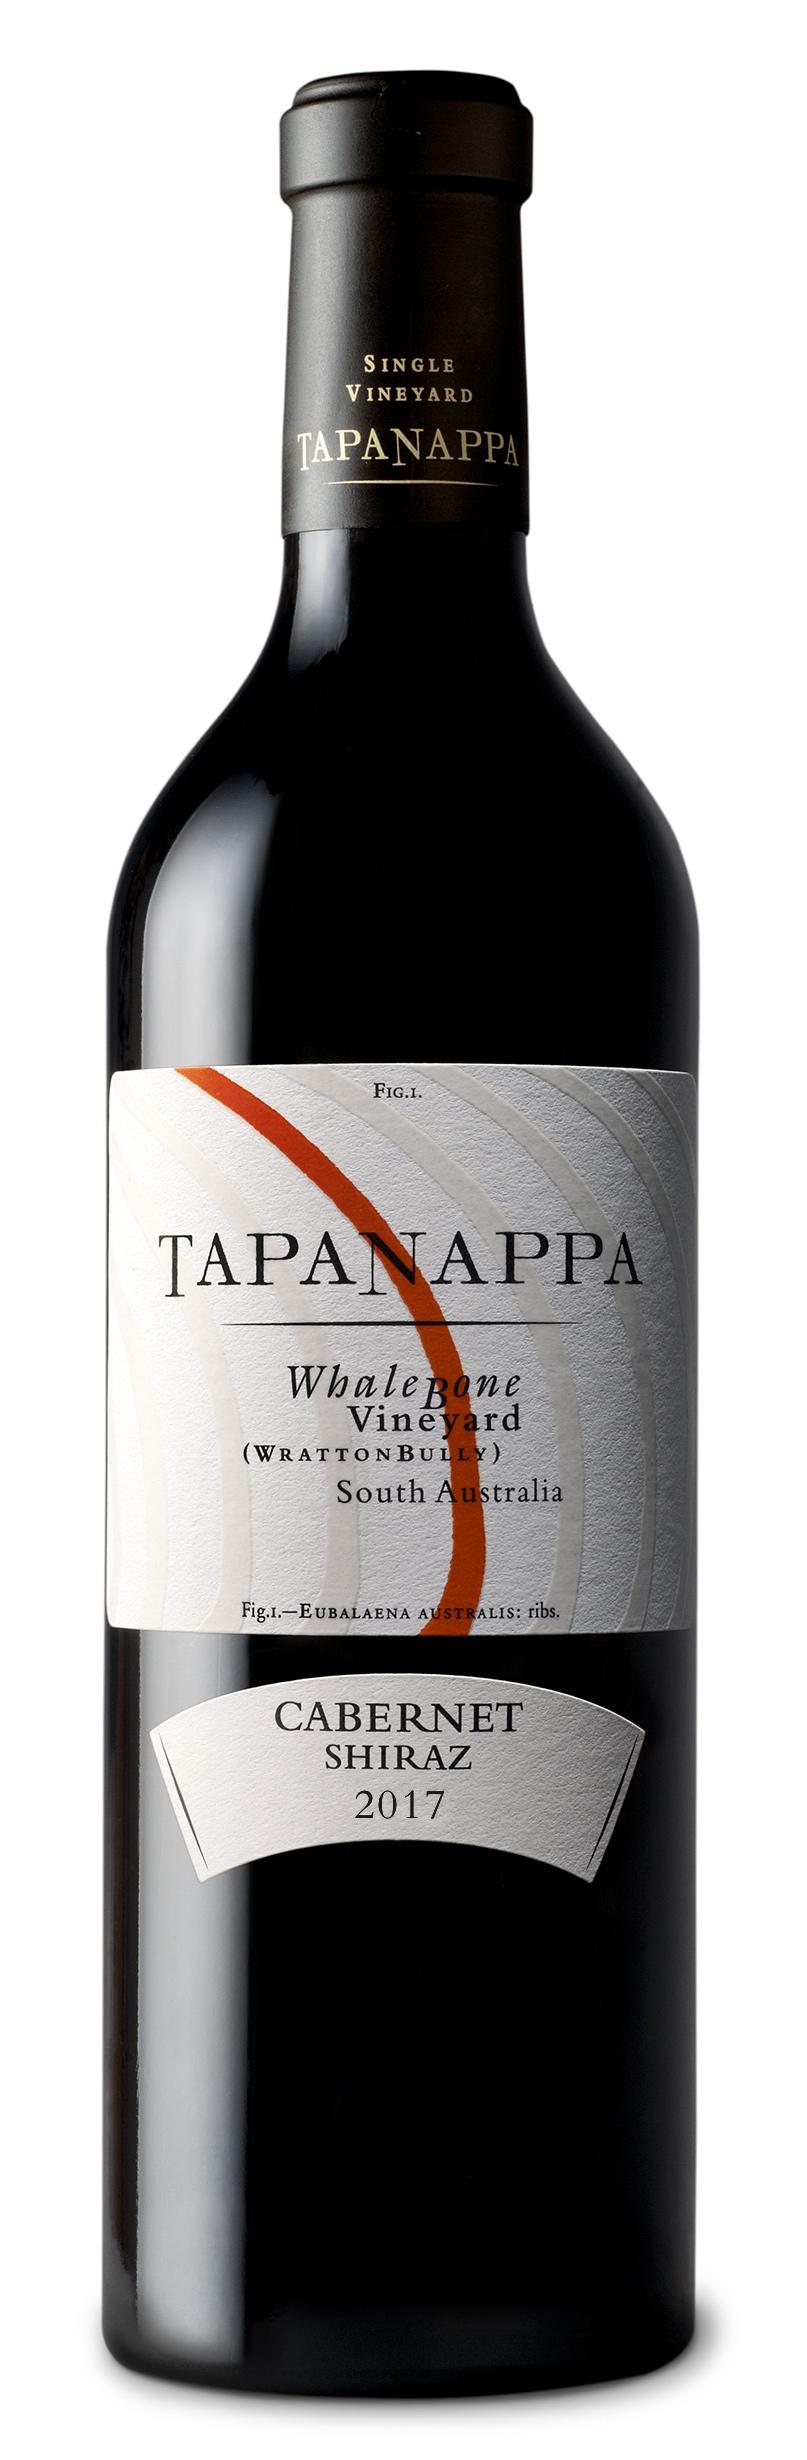 Tapanappa Whalebone Vineyard 2017 Cabernet Shiraz